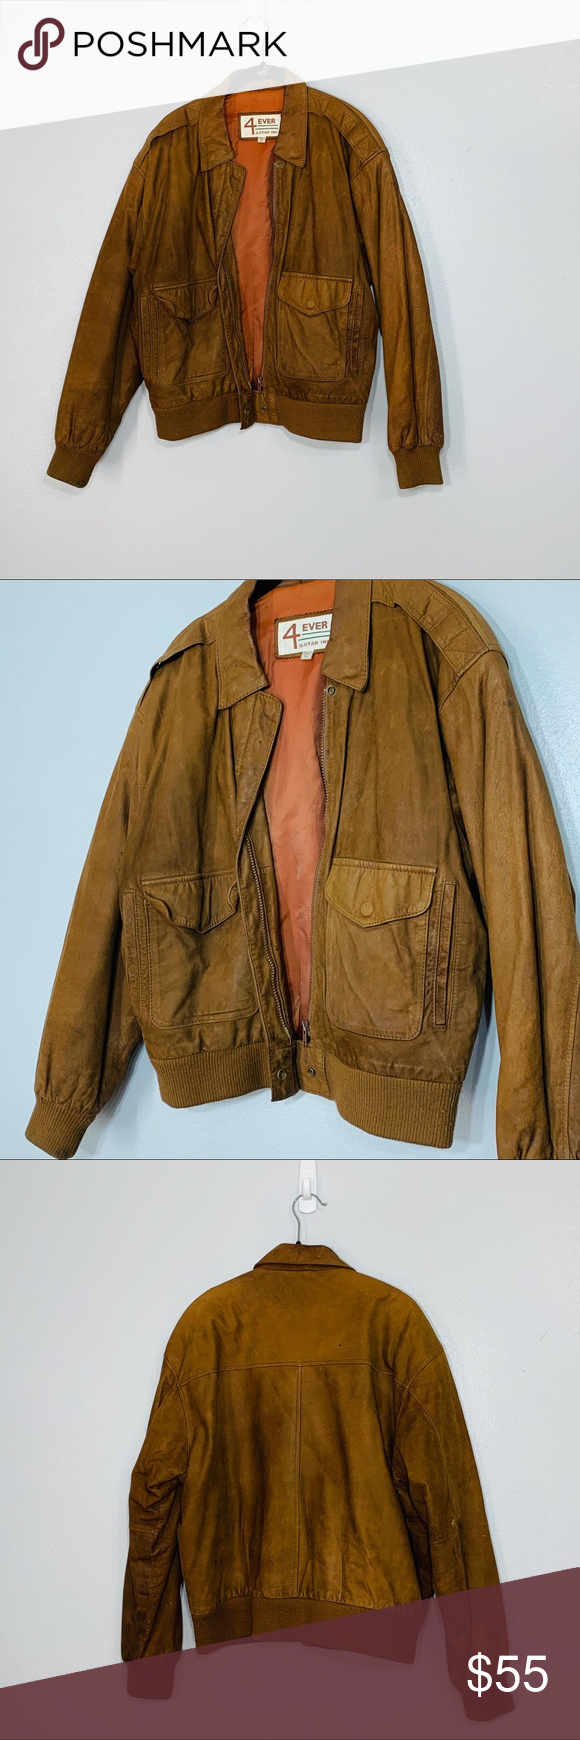 Vintage Brown Leather Bomber Jacket Women S Sz Med Leather Bomber Jacket Women Leather Bomber Jacket Brown Leather Bomber Jacket [ 1740 x 580 Pixel ]